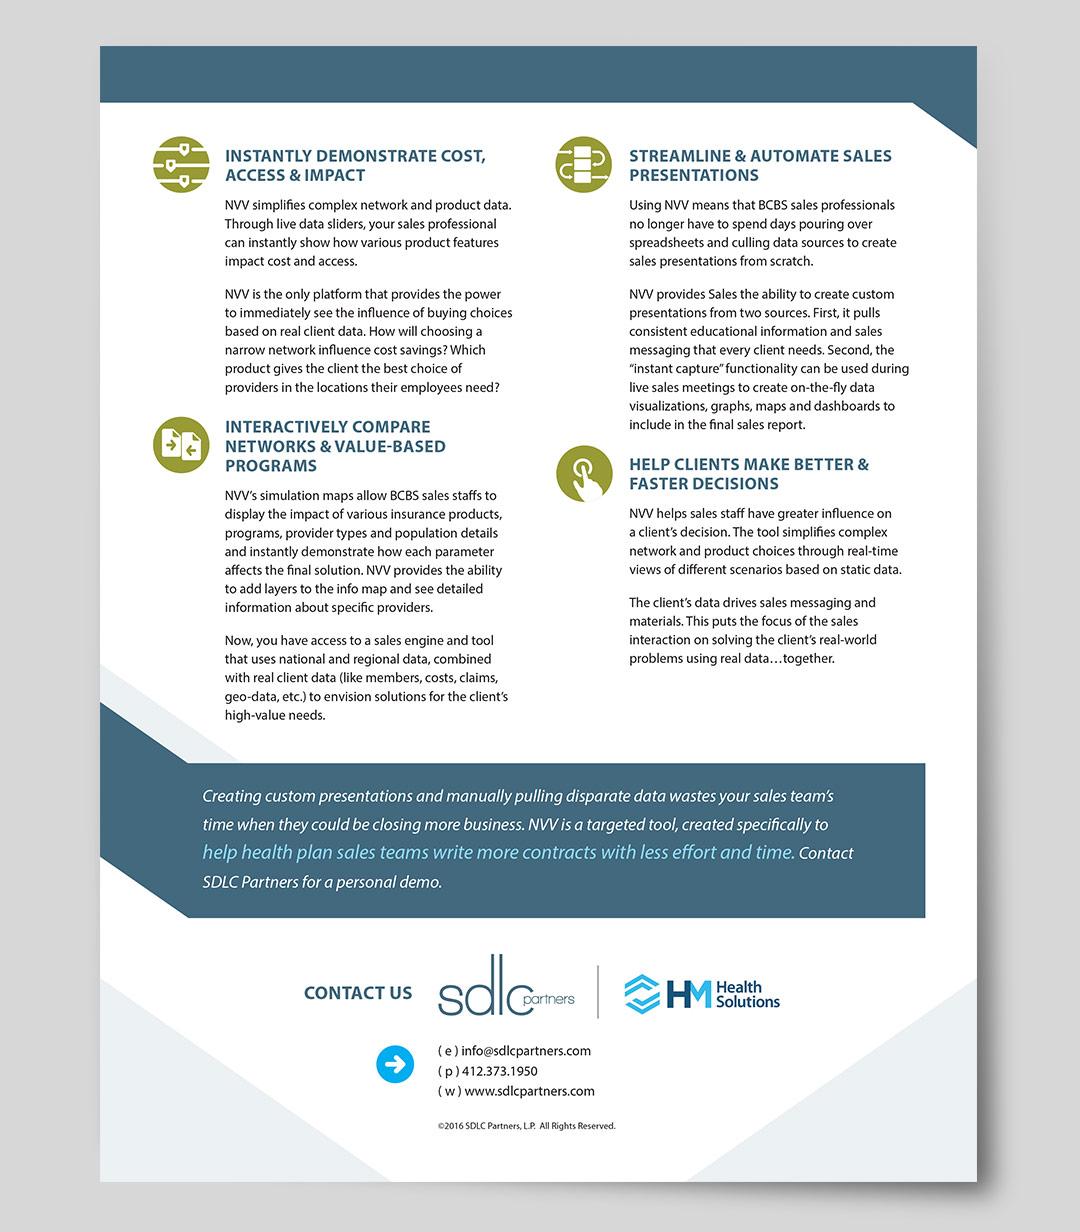 matthewspangler.com – HM Health Solutions – NVV Sales Sheet